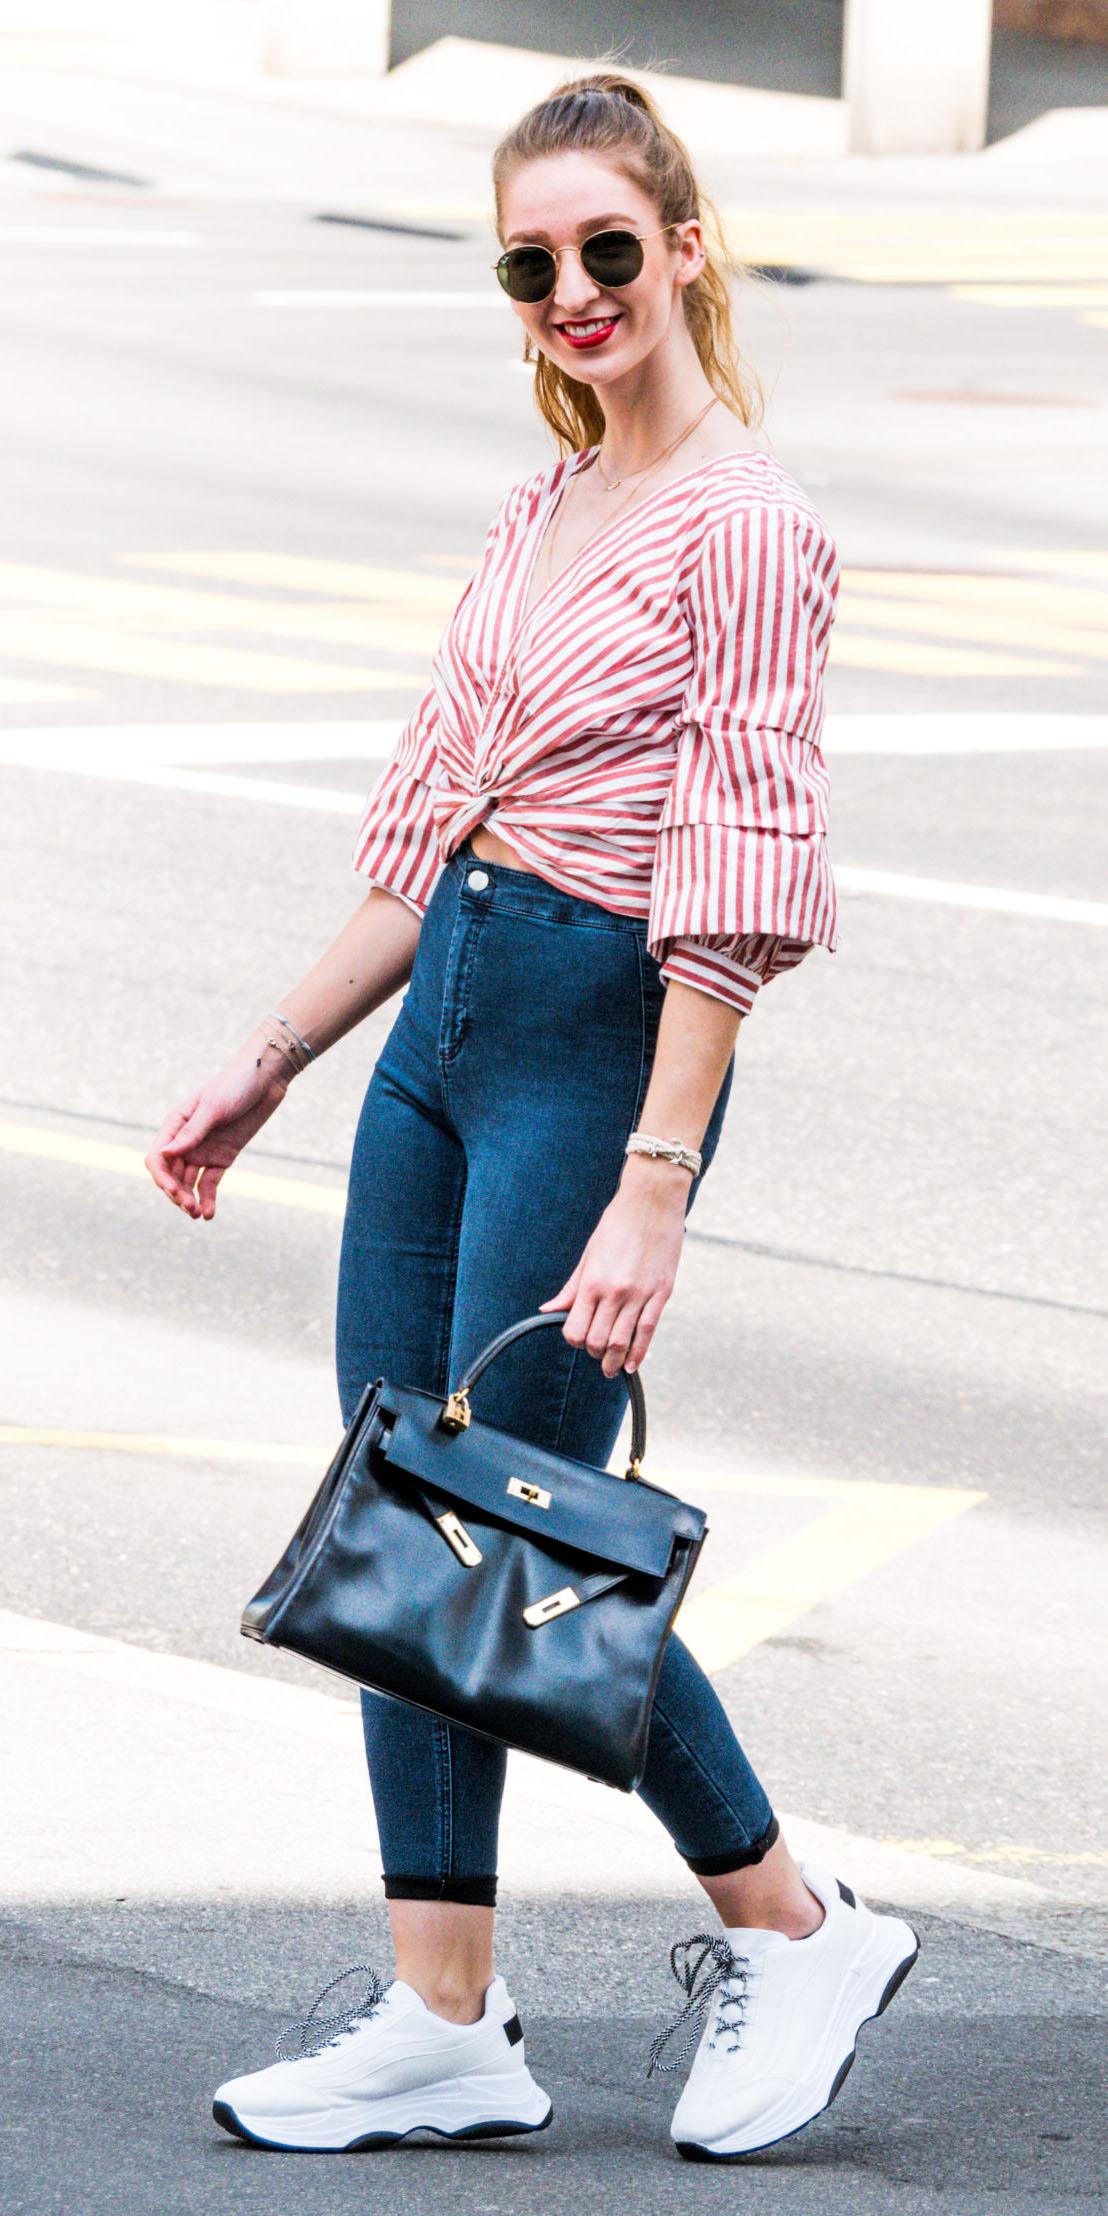 blue-navy-skinny-jeans-black-bag-red-top-wrap-stripe-blonde-pony-sun-white-shoe-sneakers-spring-summer-lunch.jpg